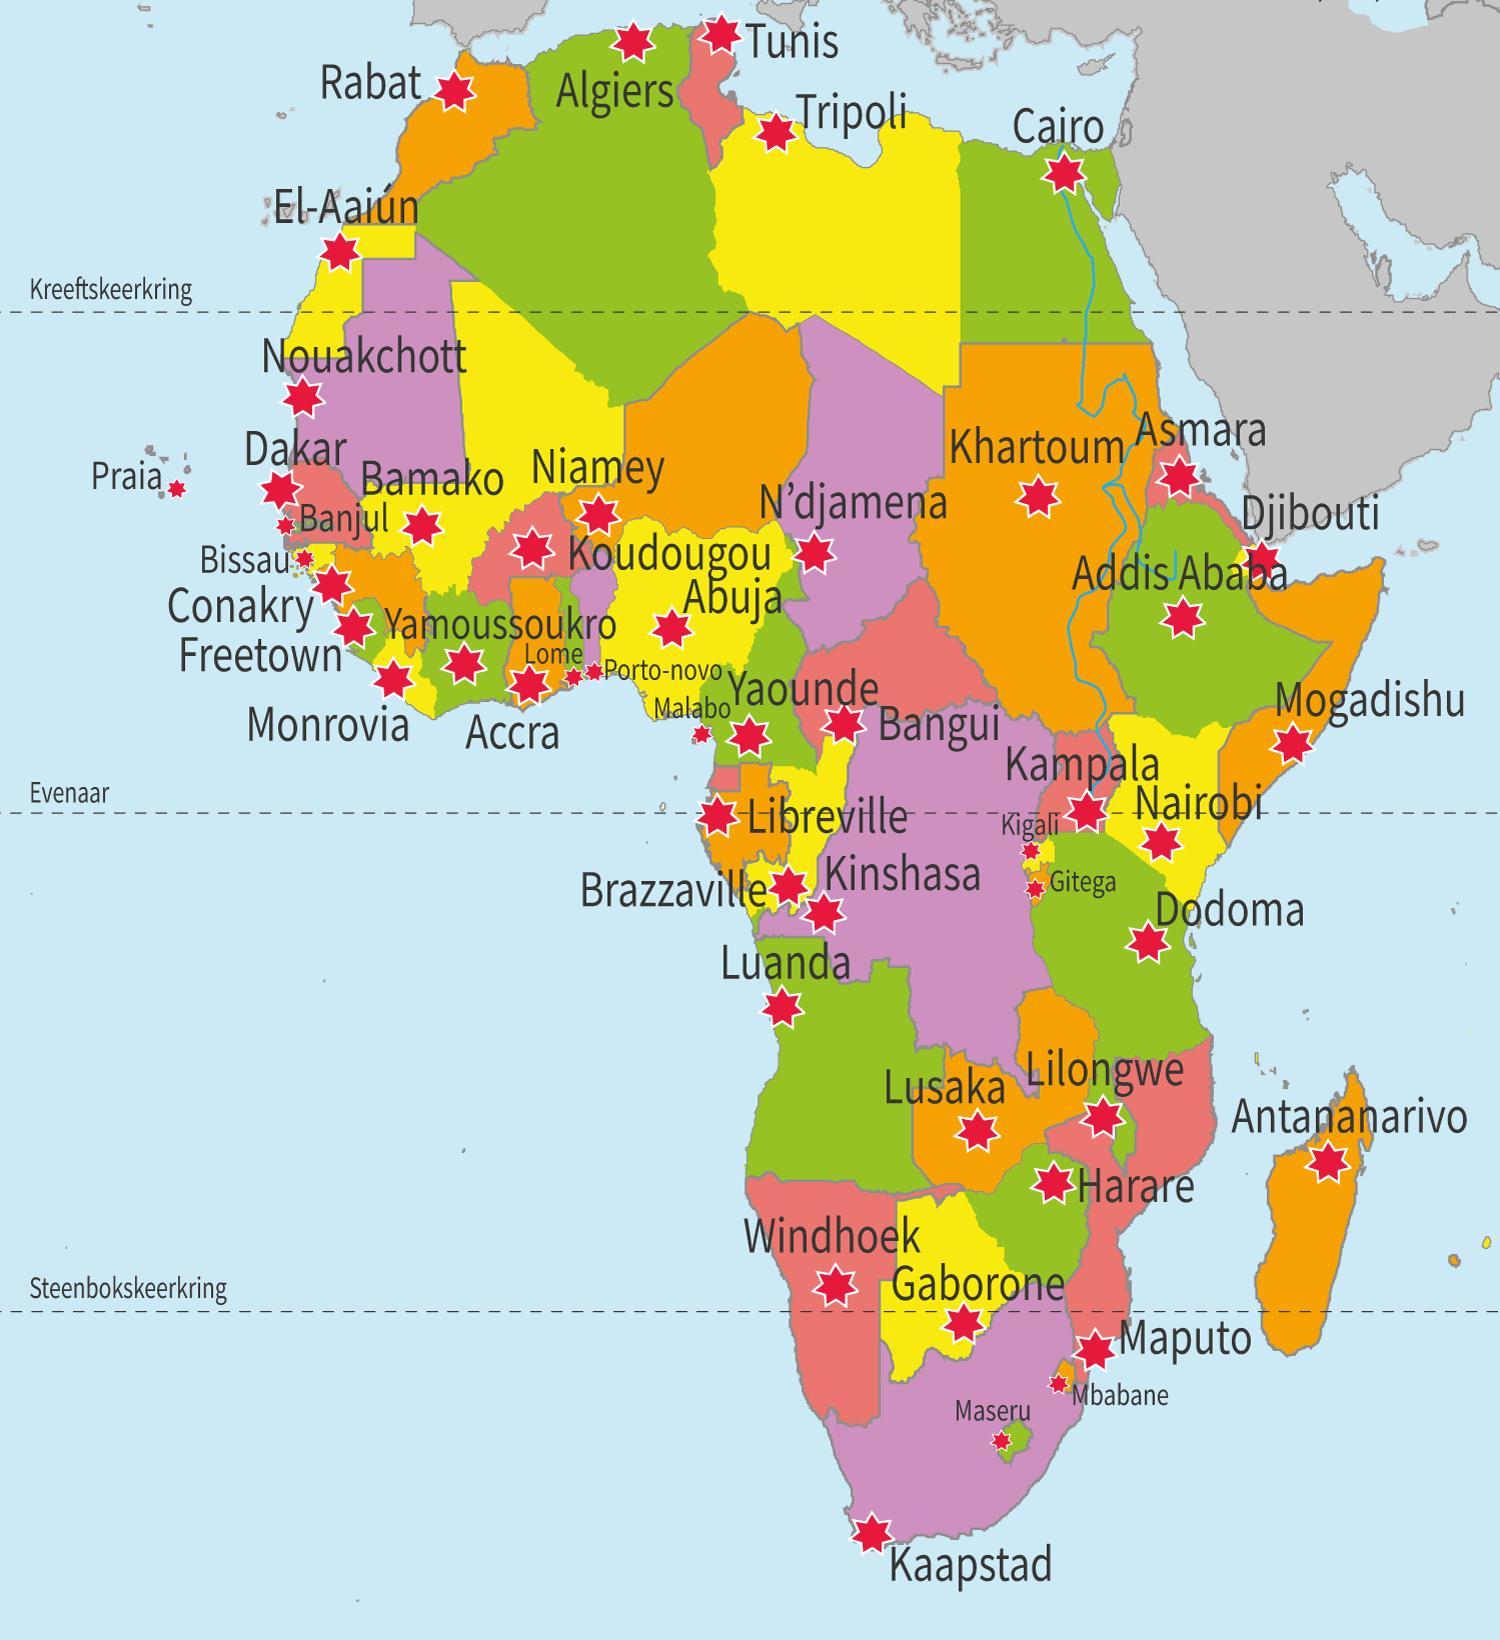 topo, topografie, Afrika, landen, Afrikaanse landen, continent Afrika, aardrijkskunde, groep 8, Junior Einstein, oefenen, steden, hoofdsteden